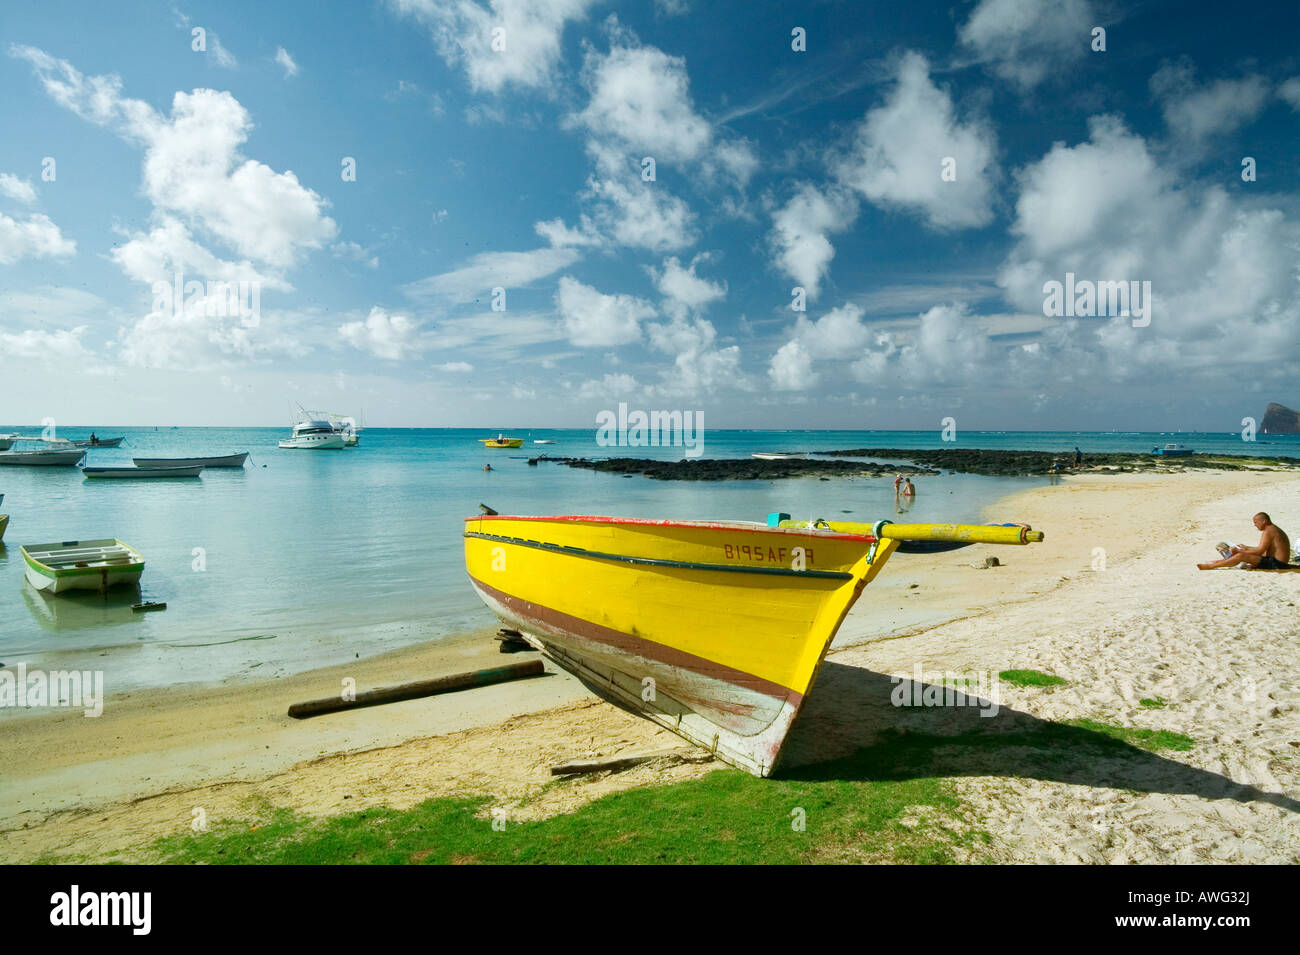 BAINBOEUF - MAURITIUS ISLAND - Stock Image